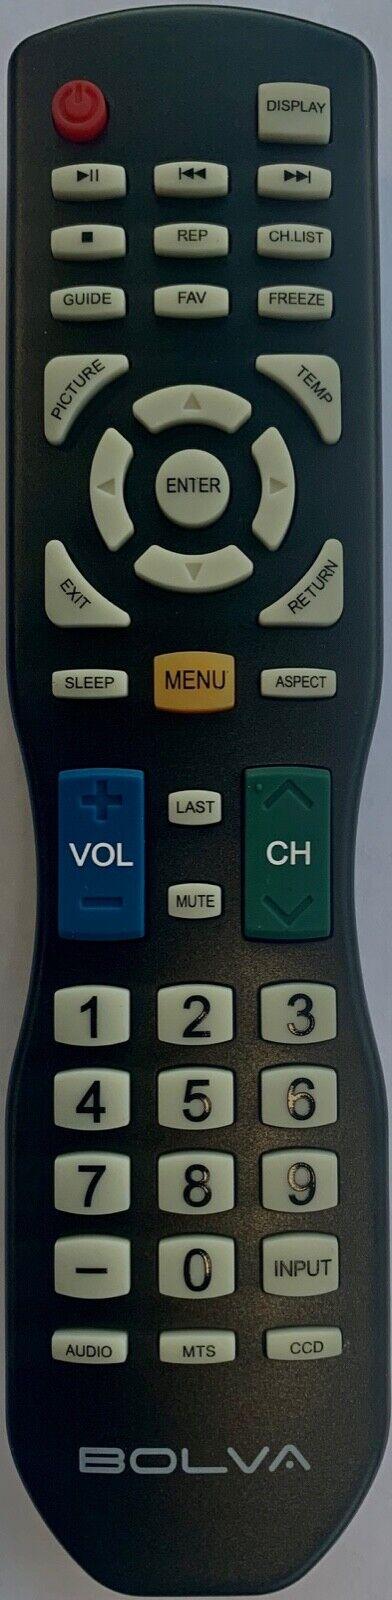 New Bolva TV Remote Control  for most of Bolva FHD TVs UHD 4K Curved Smart TVs